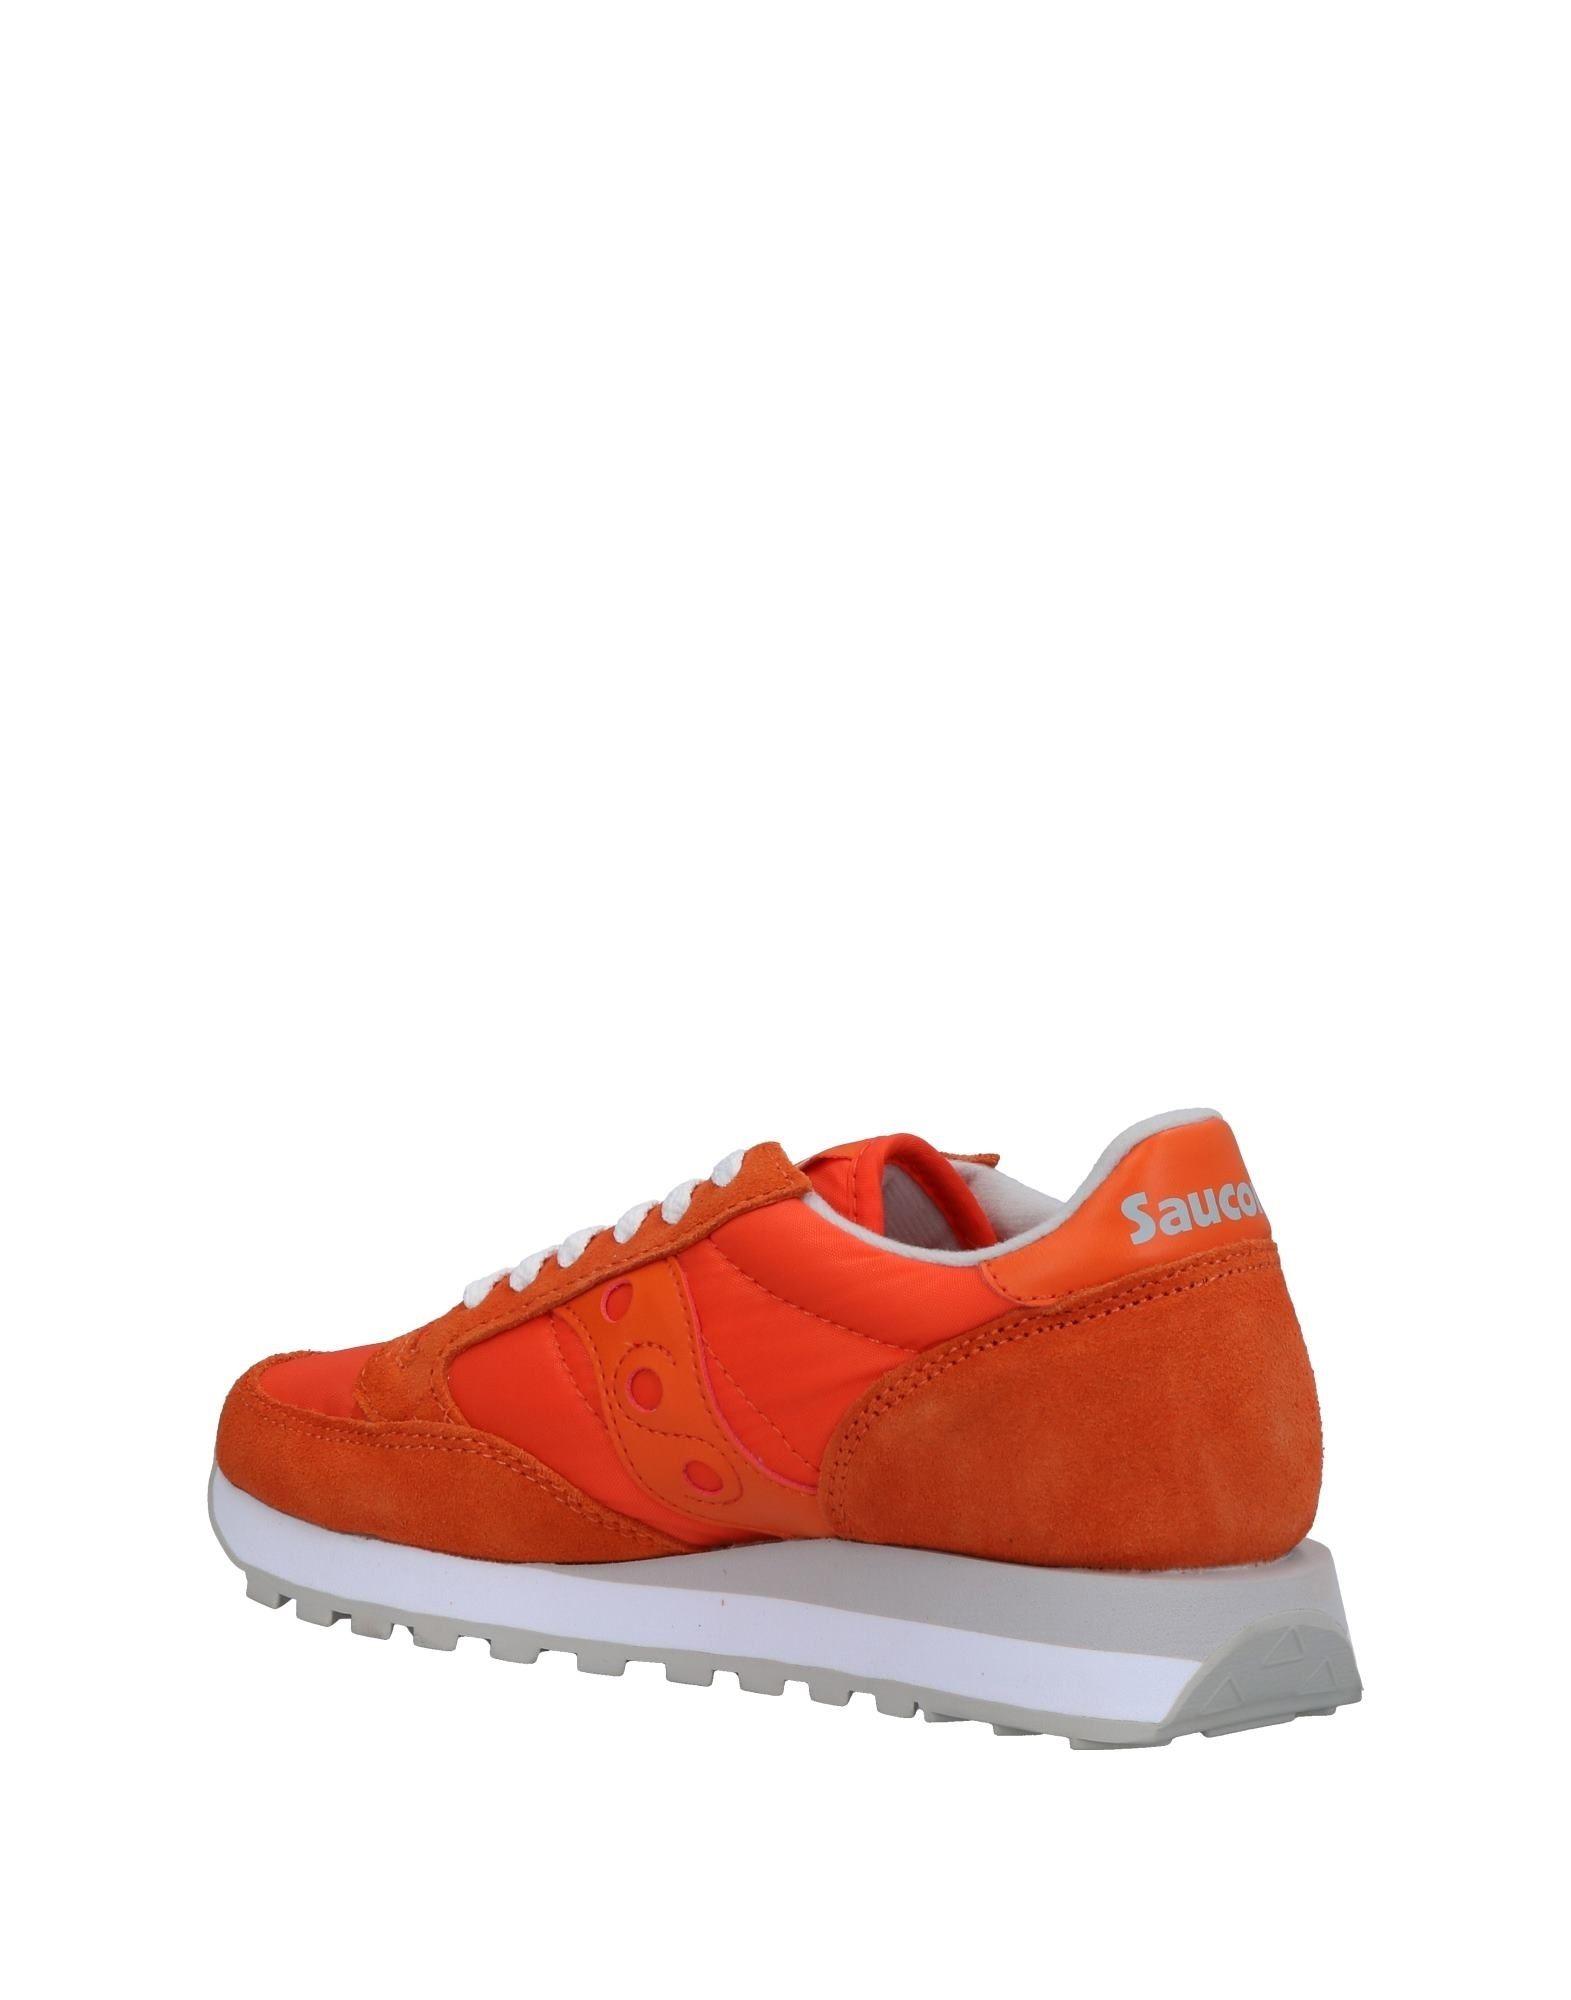 Saucony Sneakers Preis-Leistungs-Verhältnis, Damen Gutes Preis-Leistungs-Verhältnis, Sneakers es lohnt sich decd9b